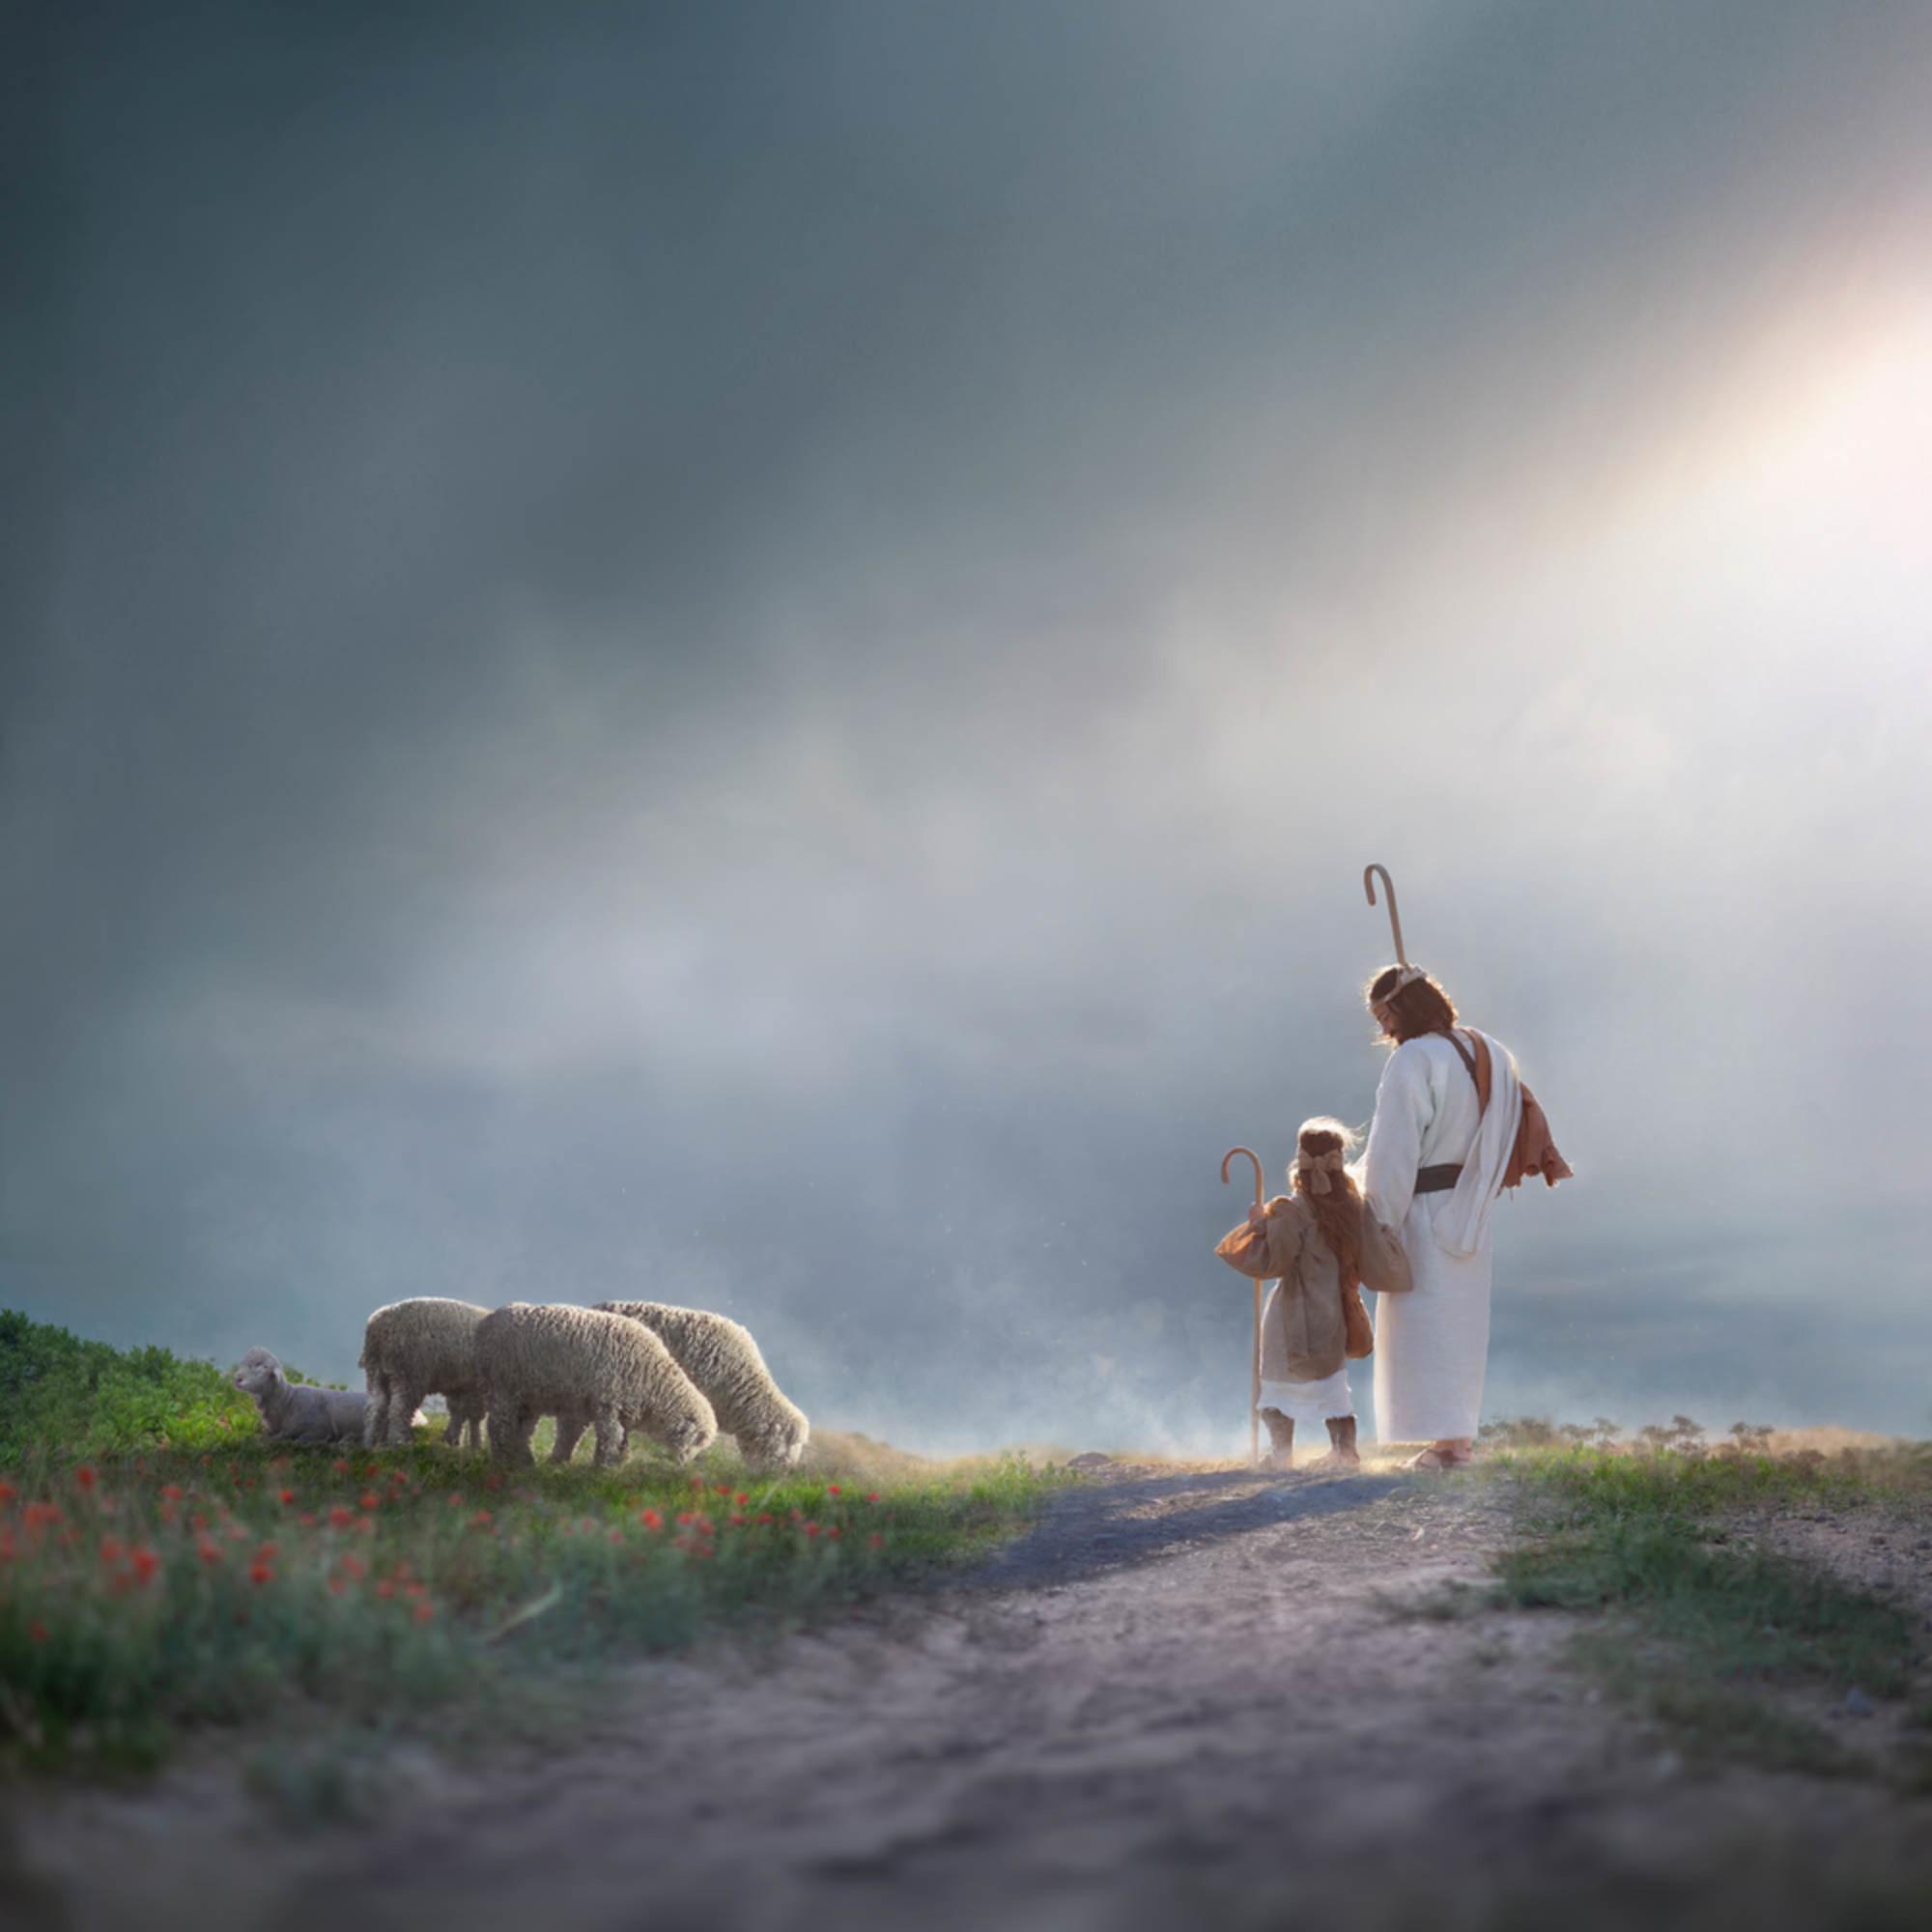 Kelsy and jesse lightweave my young shepherd qi4vaz